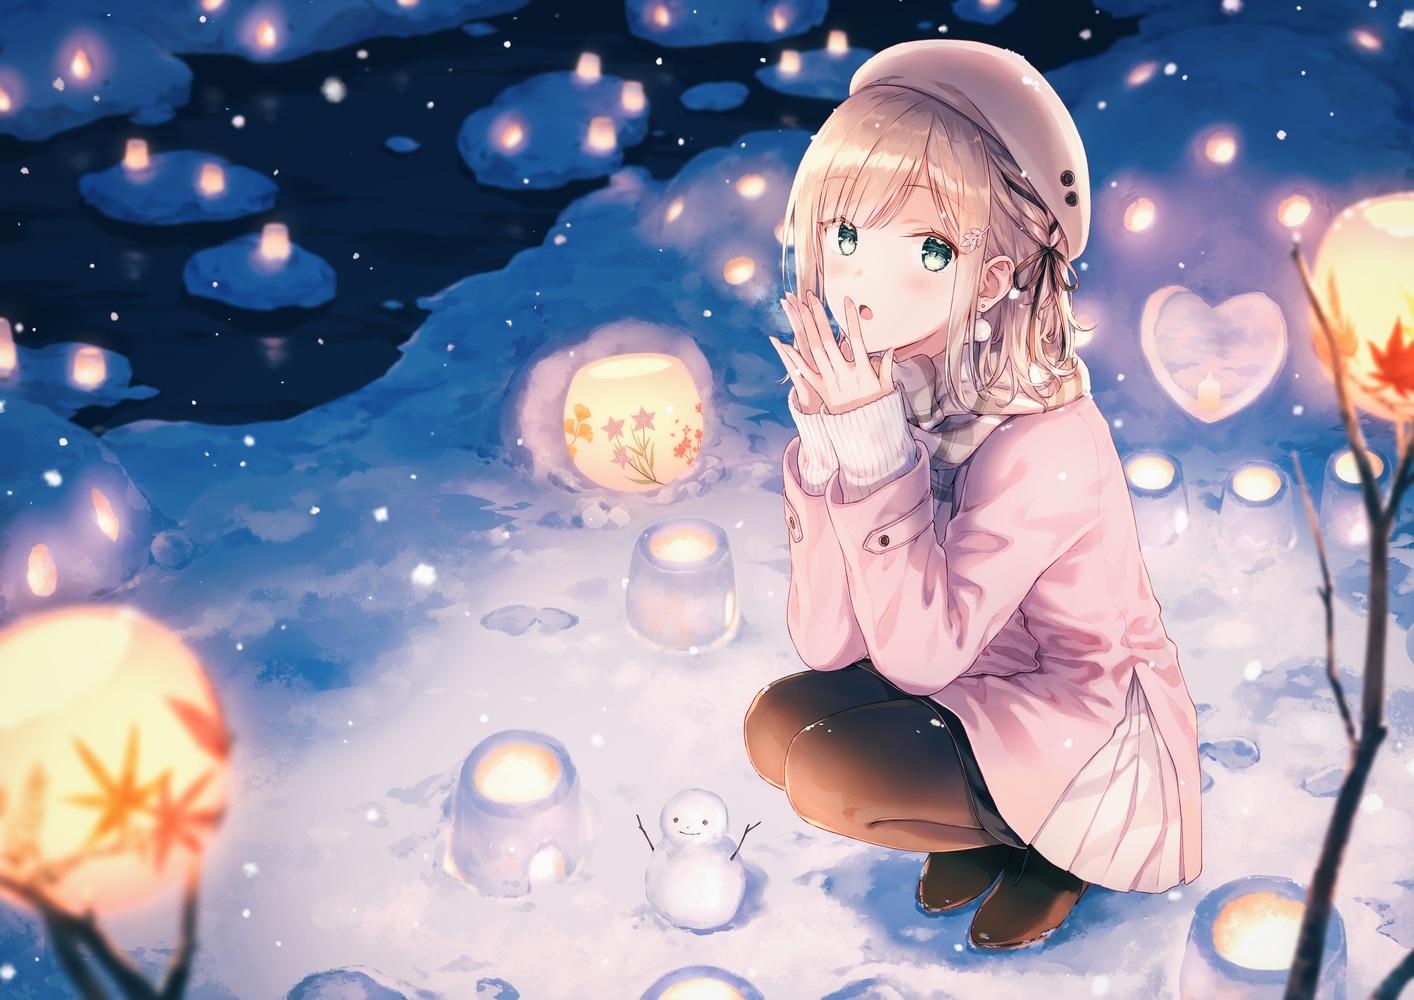 blush green_eyes hat hiten_goane_ryu original snow snowman winter